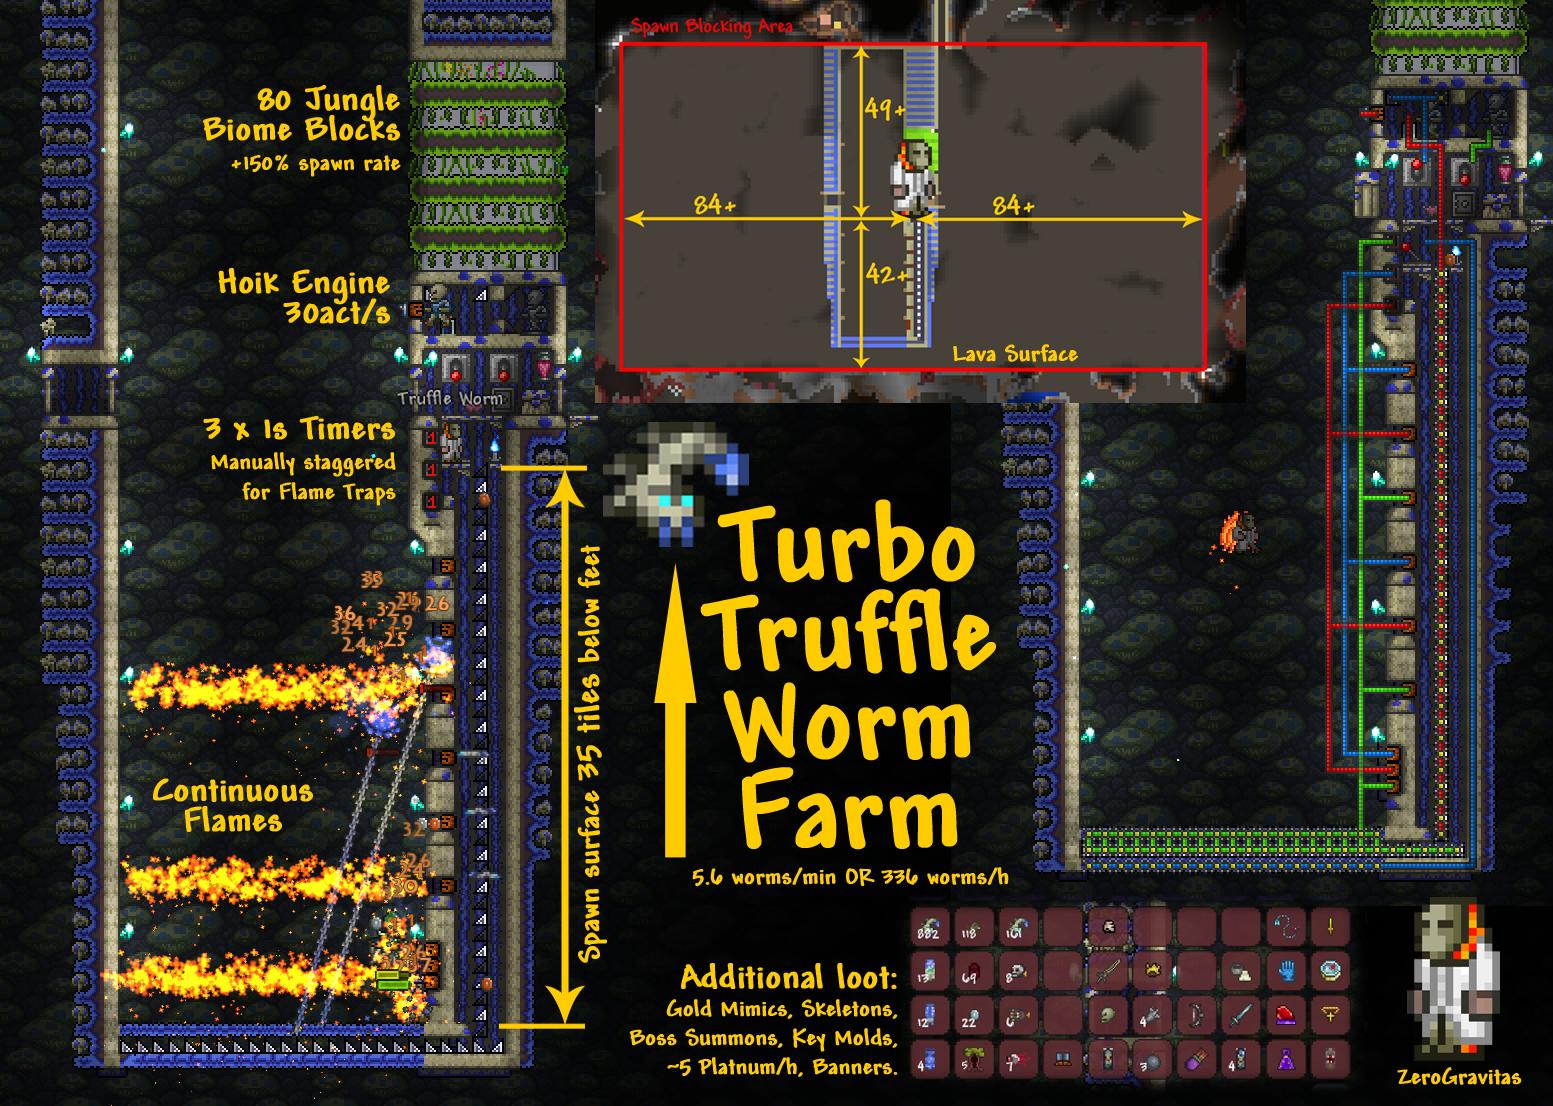 Turbo Truffle Worm Farm Vertical Hoik Engine Powered Spawn Terraria Wiring Tutorial Turbotruffle Full Diagram1